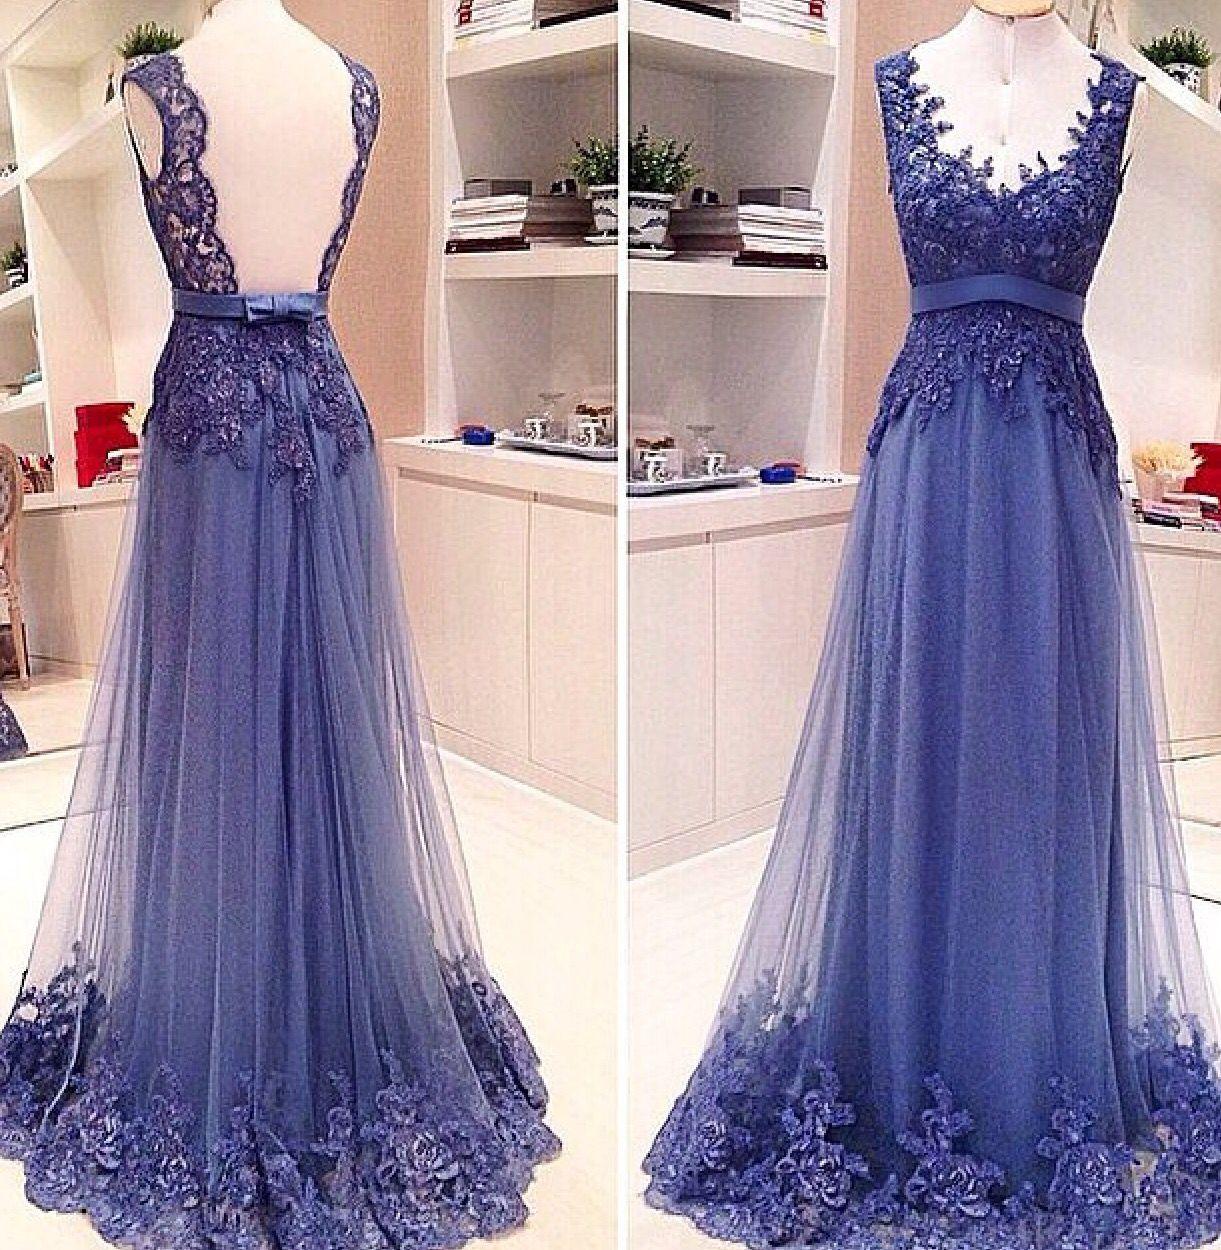 Tule bordado estilo pinterest prom banquet dresses and gala